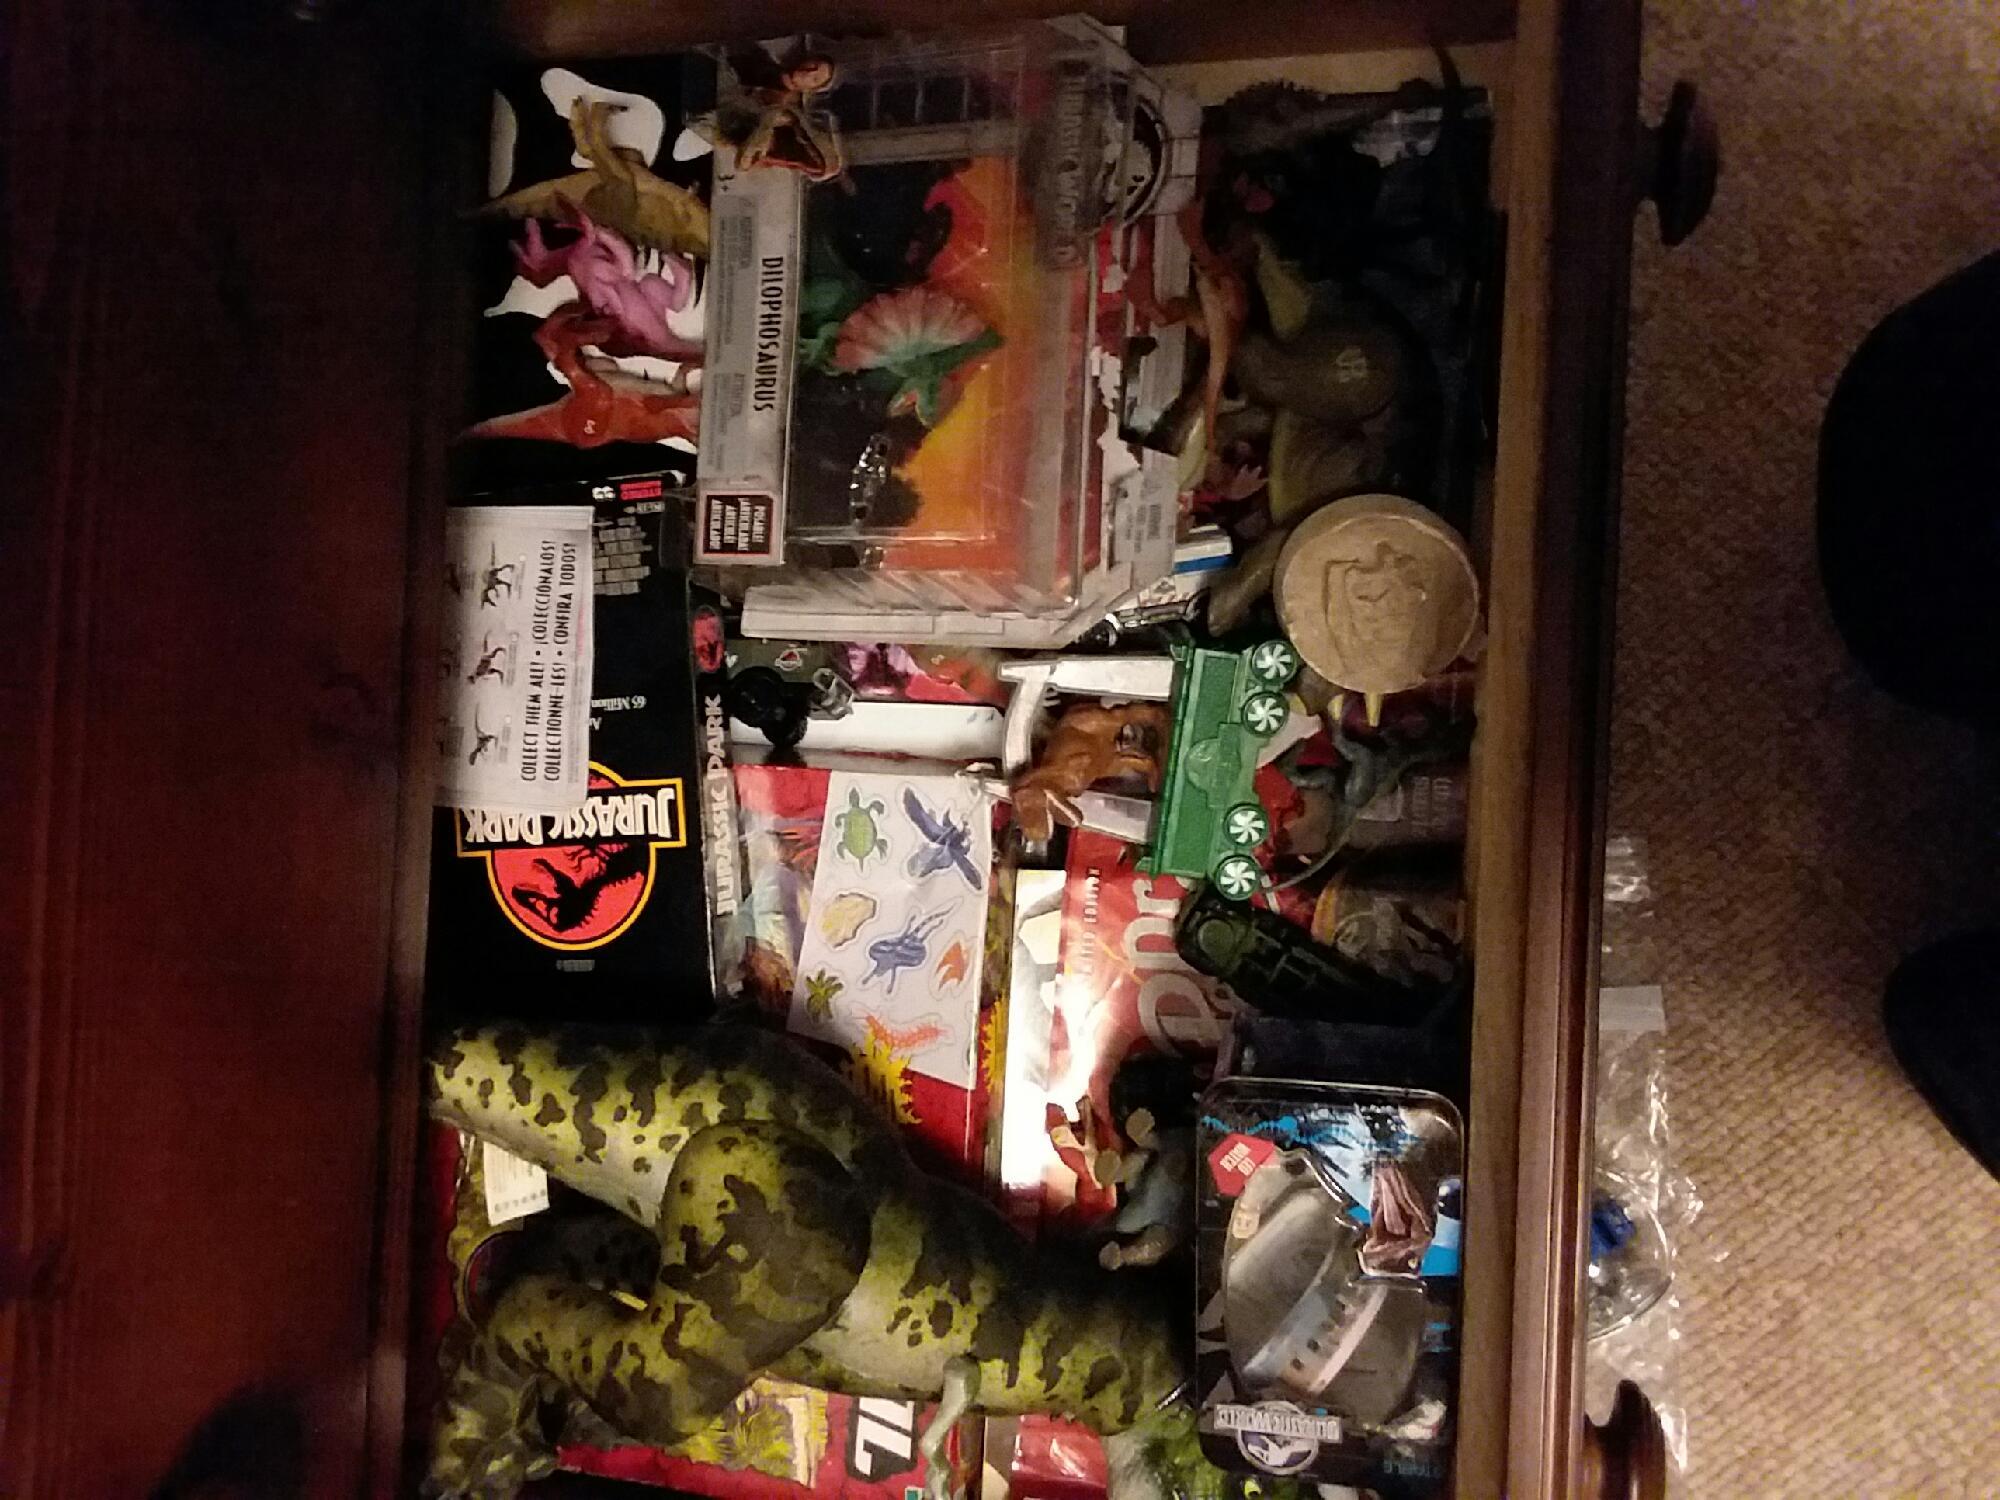 My Jurassic park/world collection.